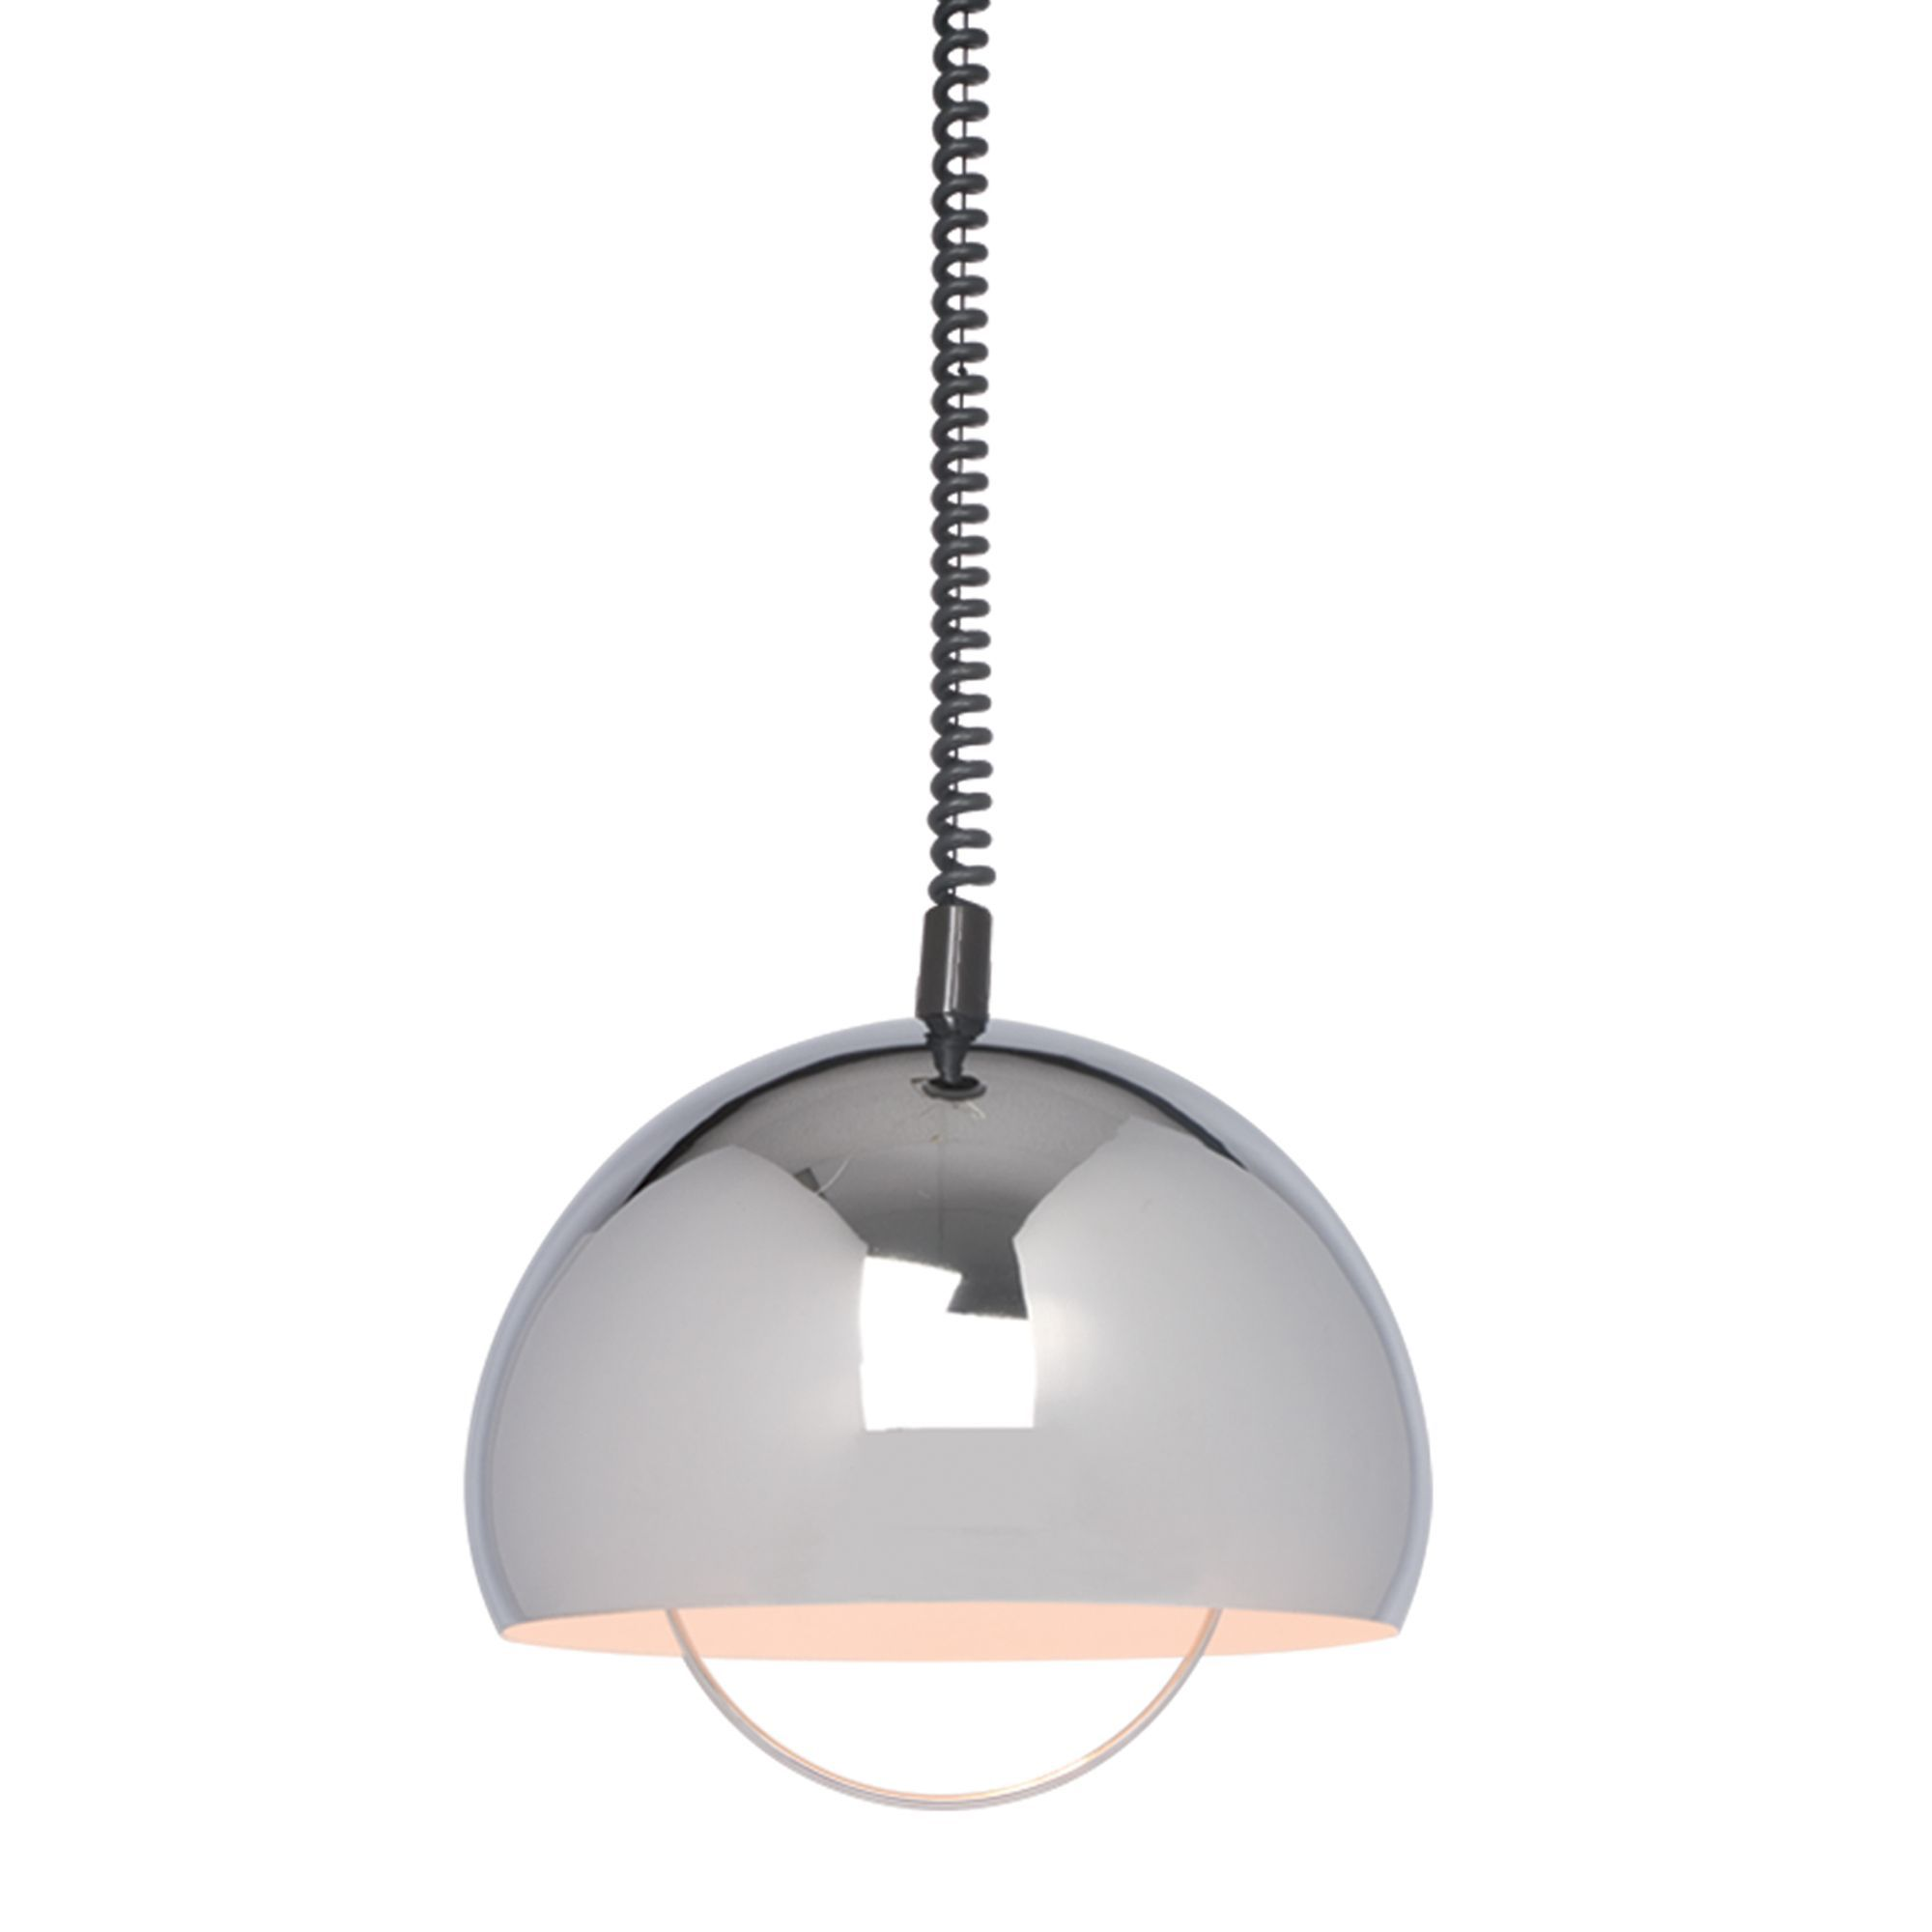 Zodiac Dome Chrome Effect Pendant Ceiling Light